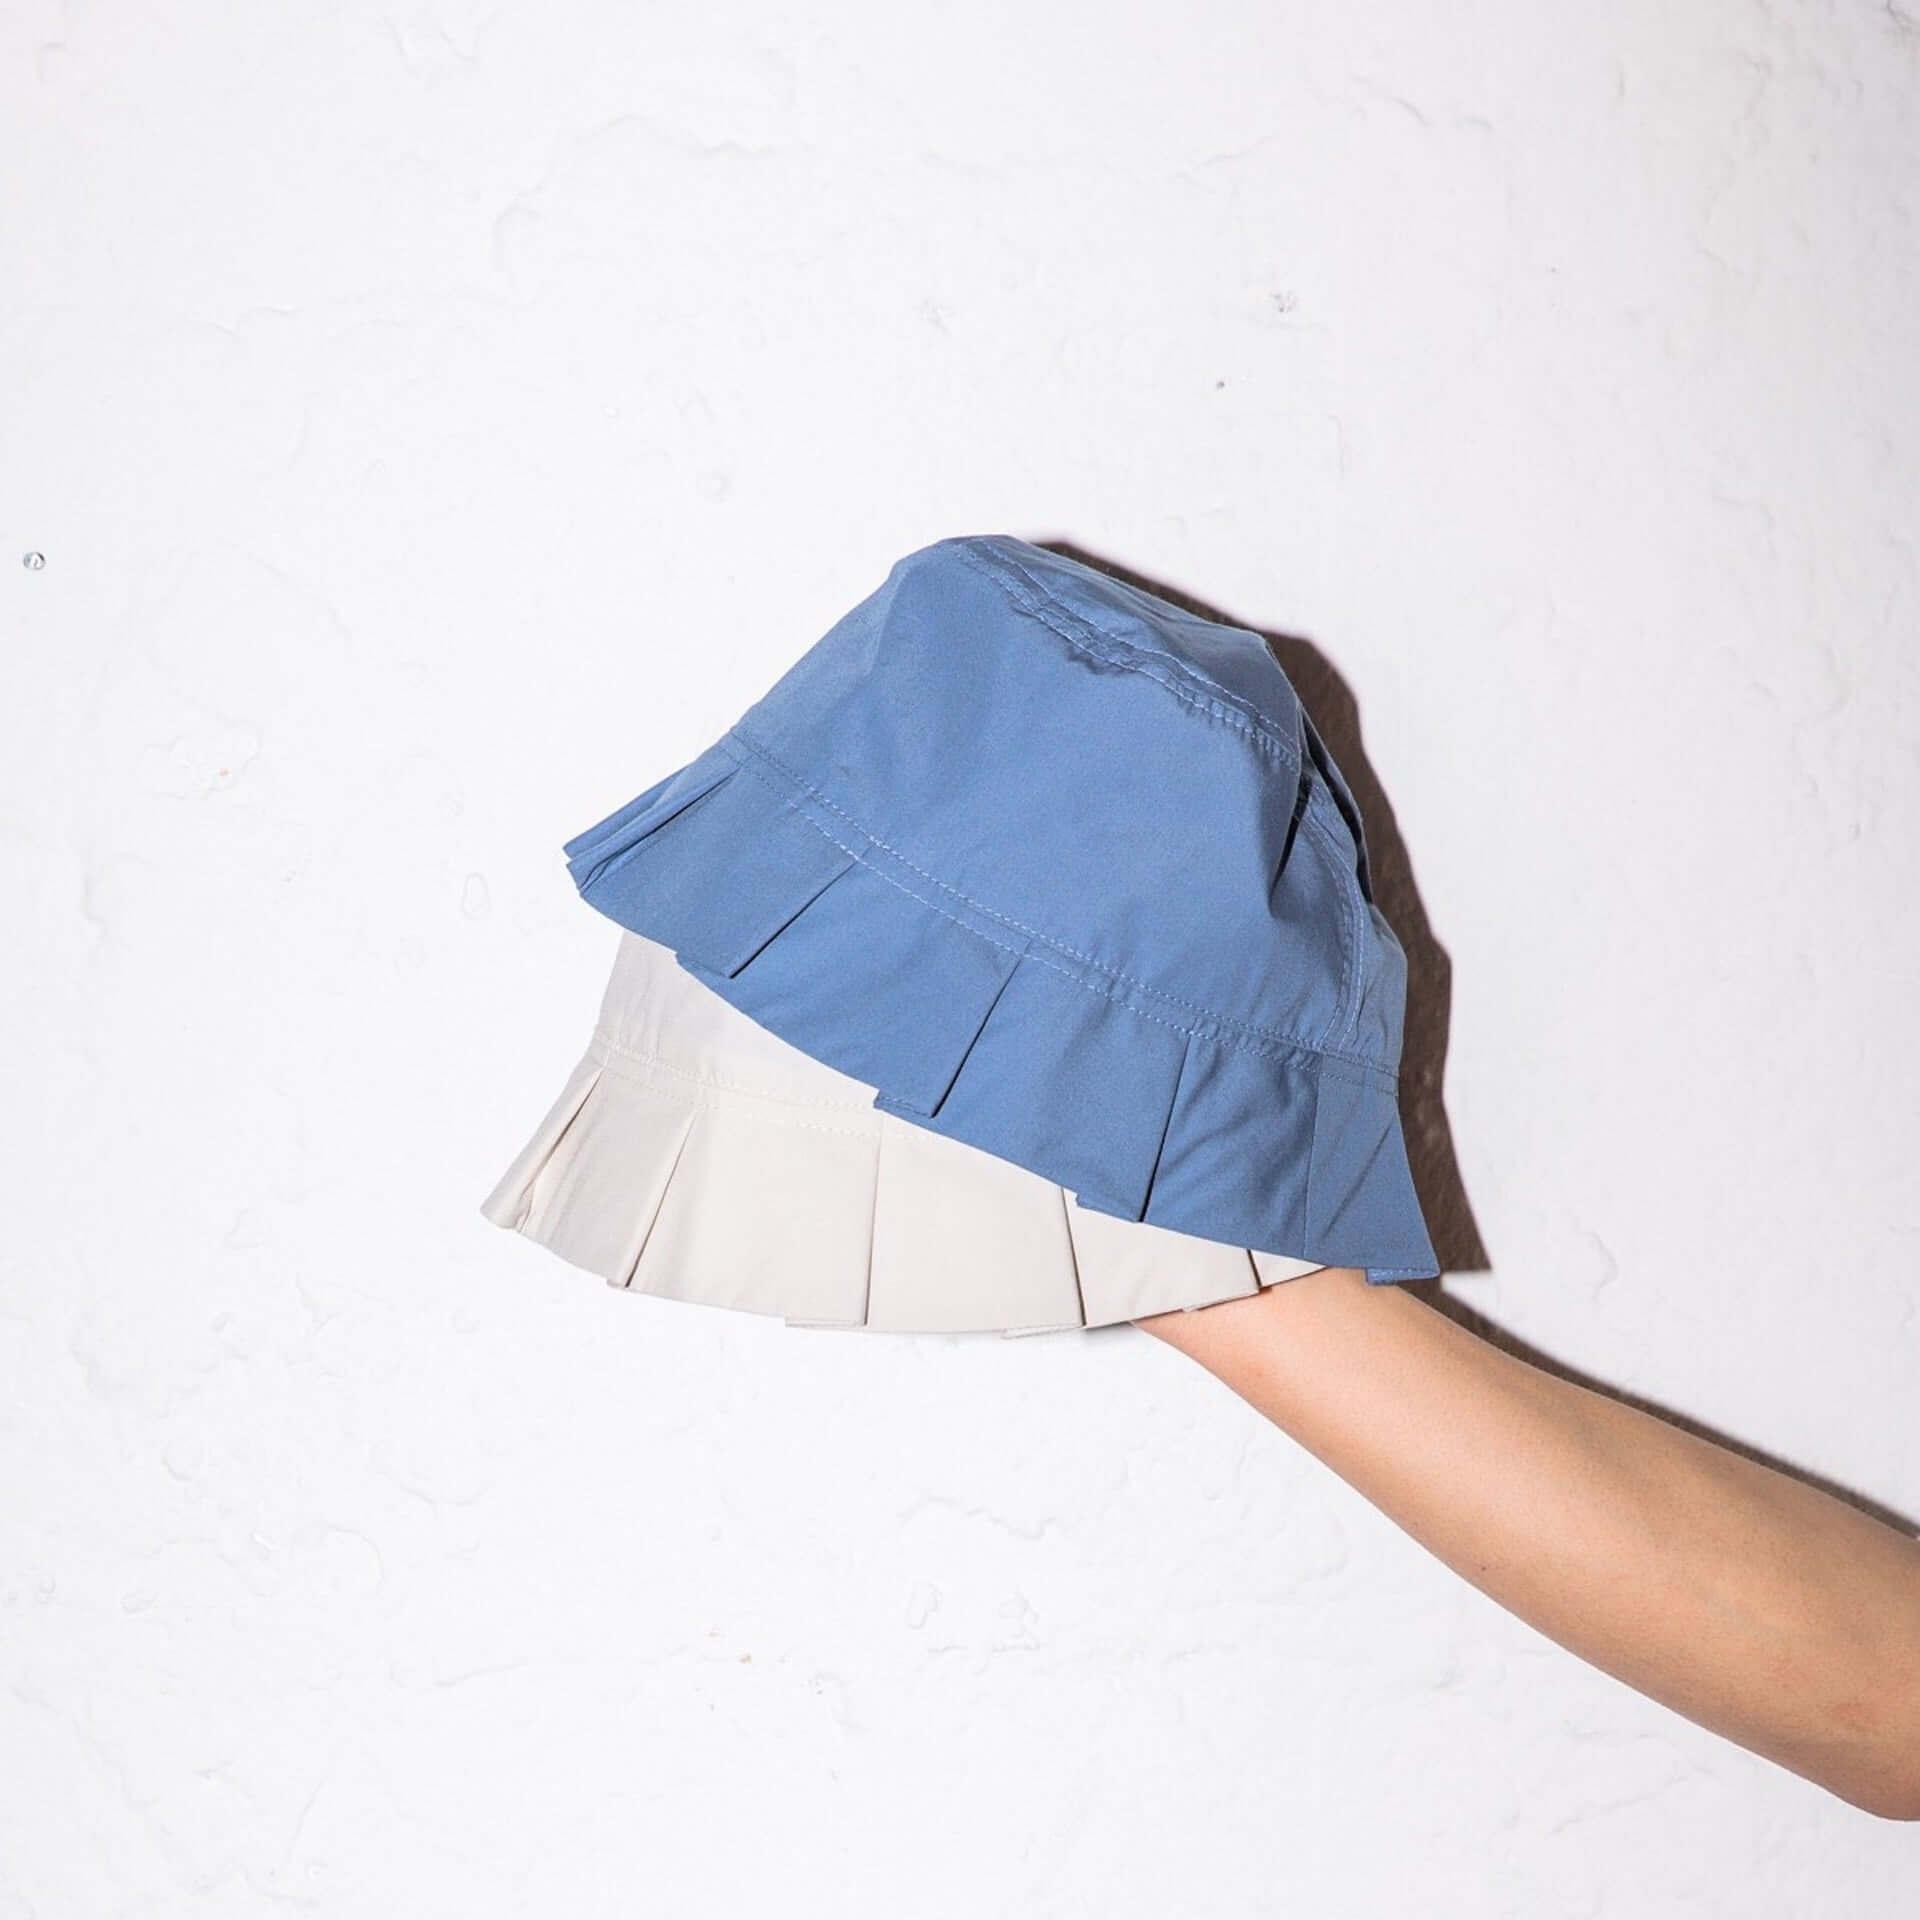 rajabrookeのポップアップショップがビームスT 原宿にて開催決定!UC EAST、VOYAGE UTOPIAによるTシャツなど展開 lf210309_rajabrooke_10-1920x1920